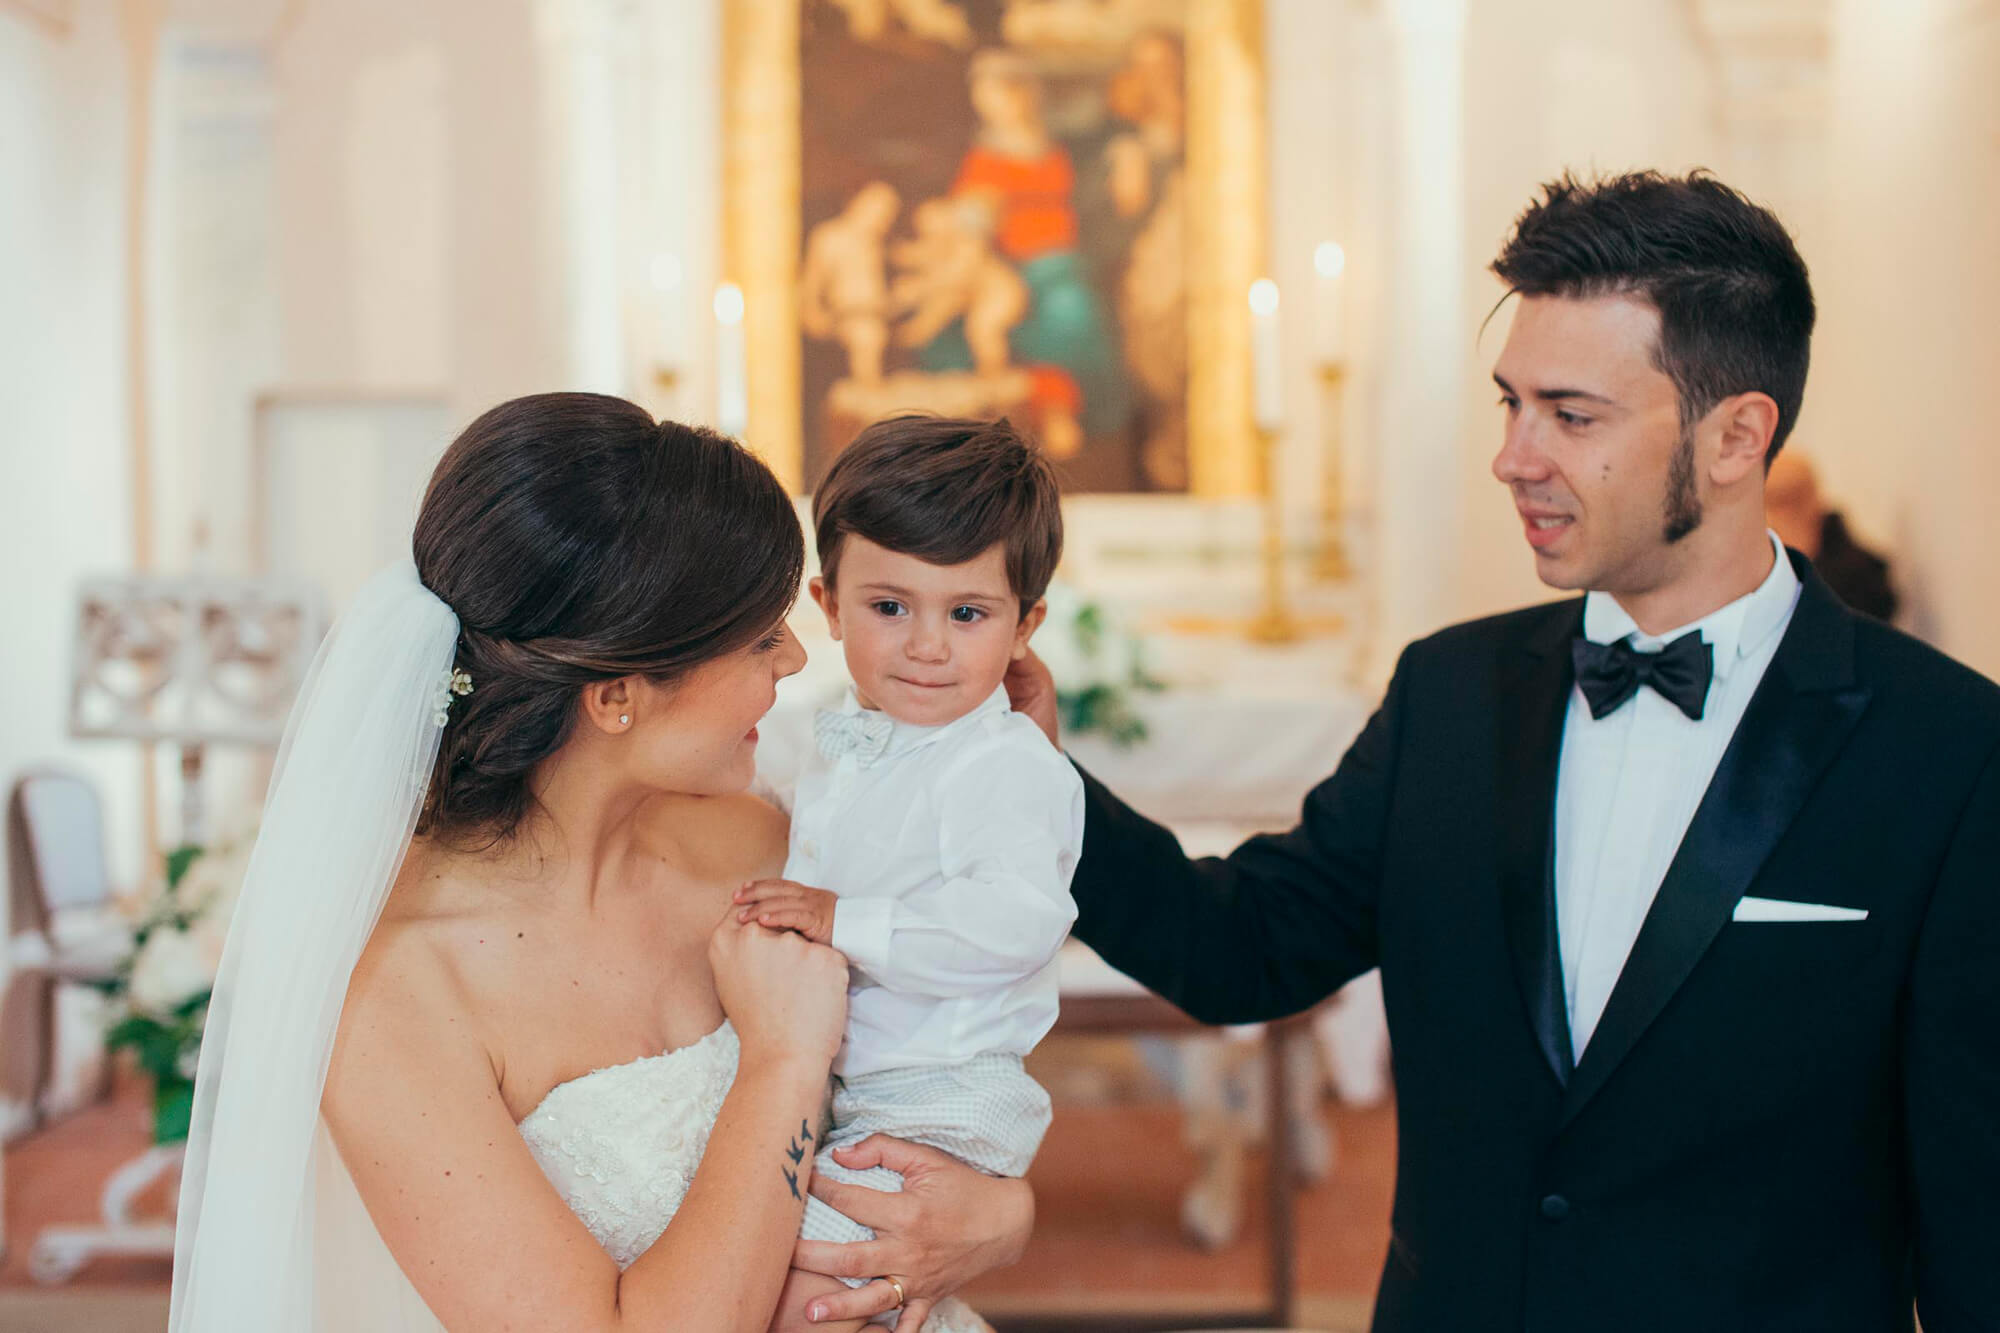 069-arezzo-wedding-photographer.jpg